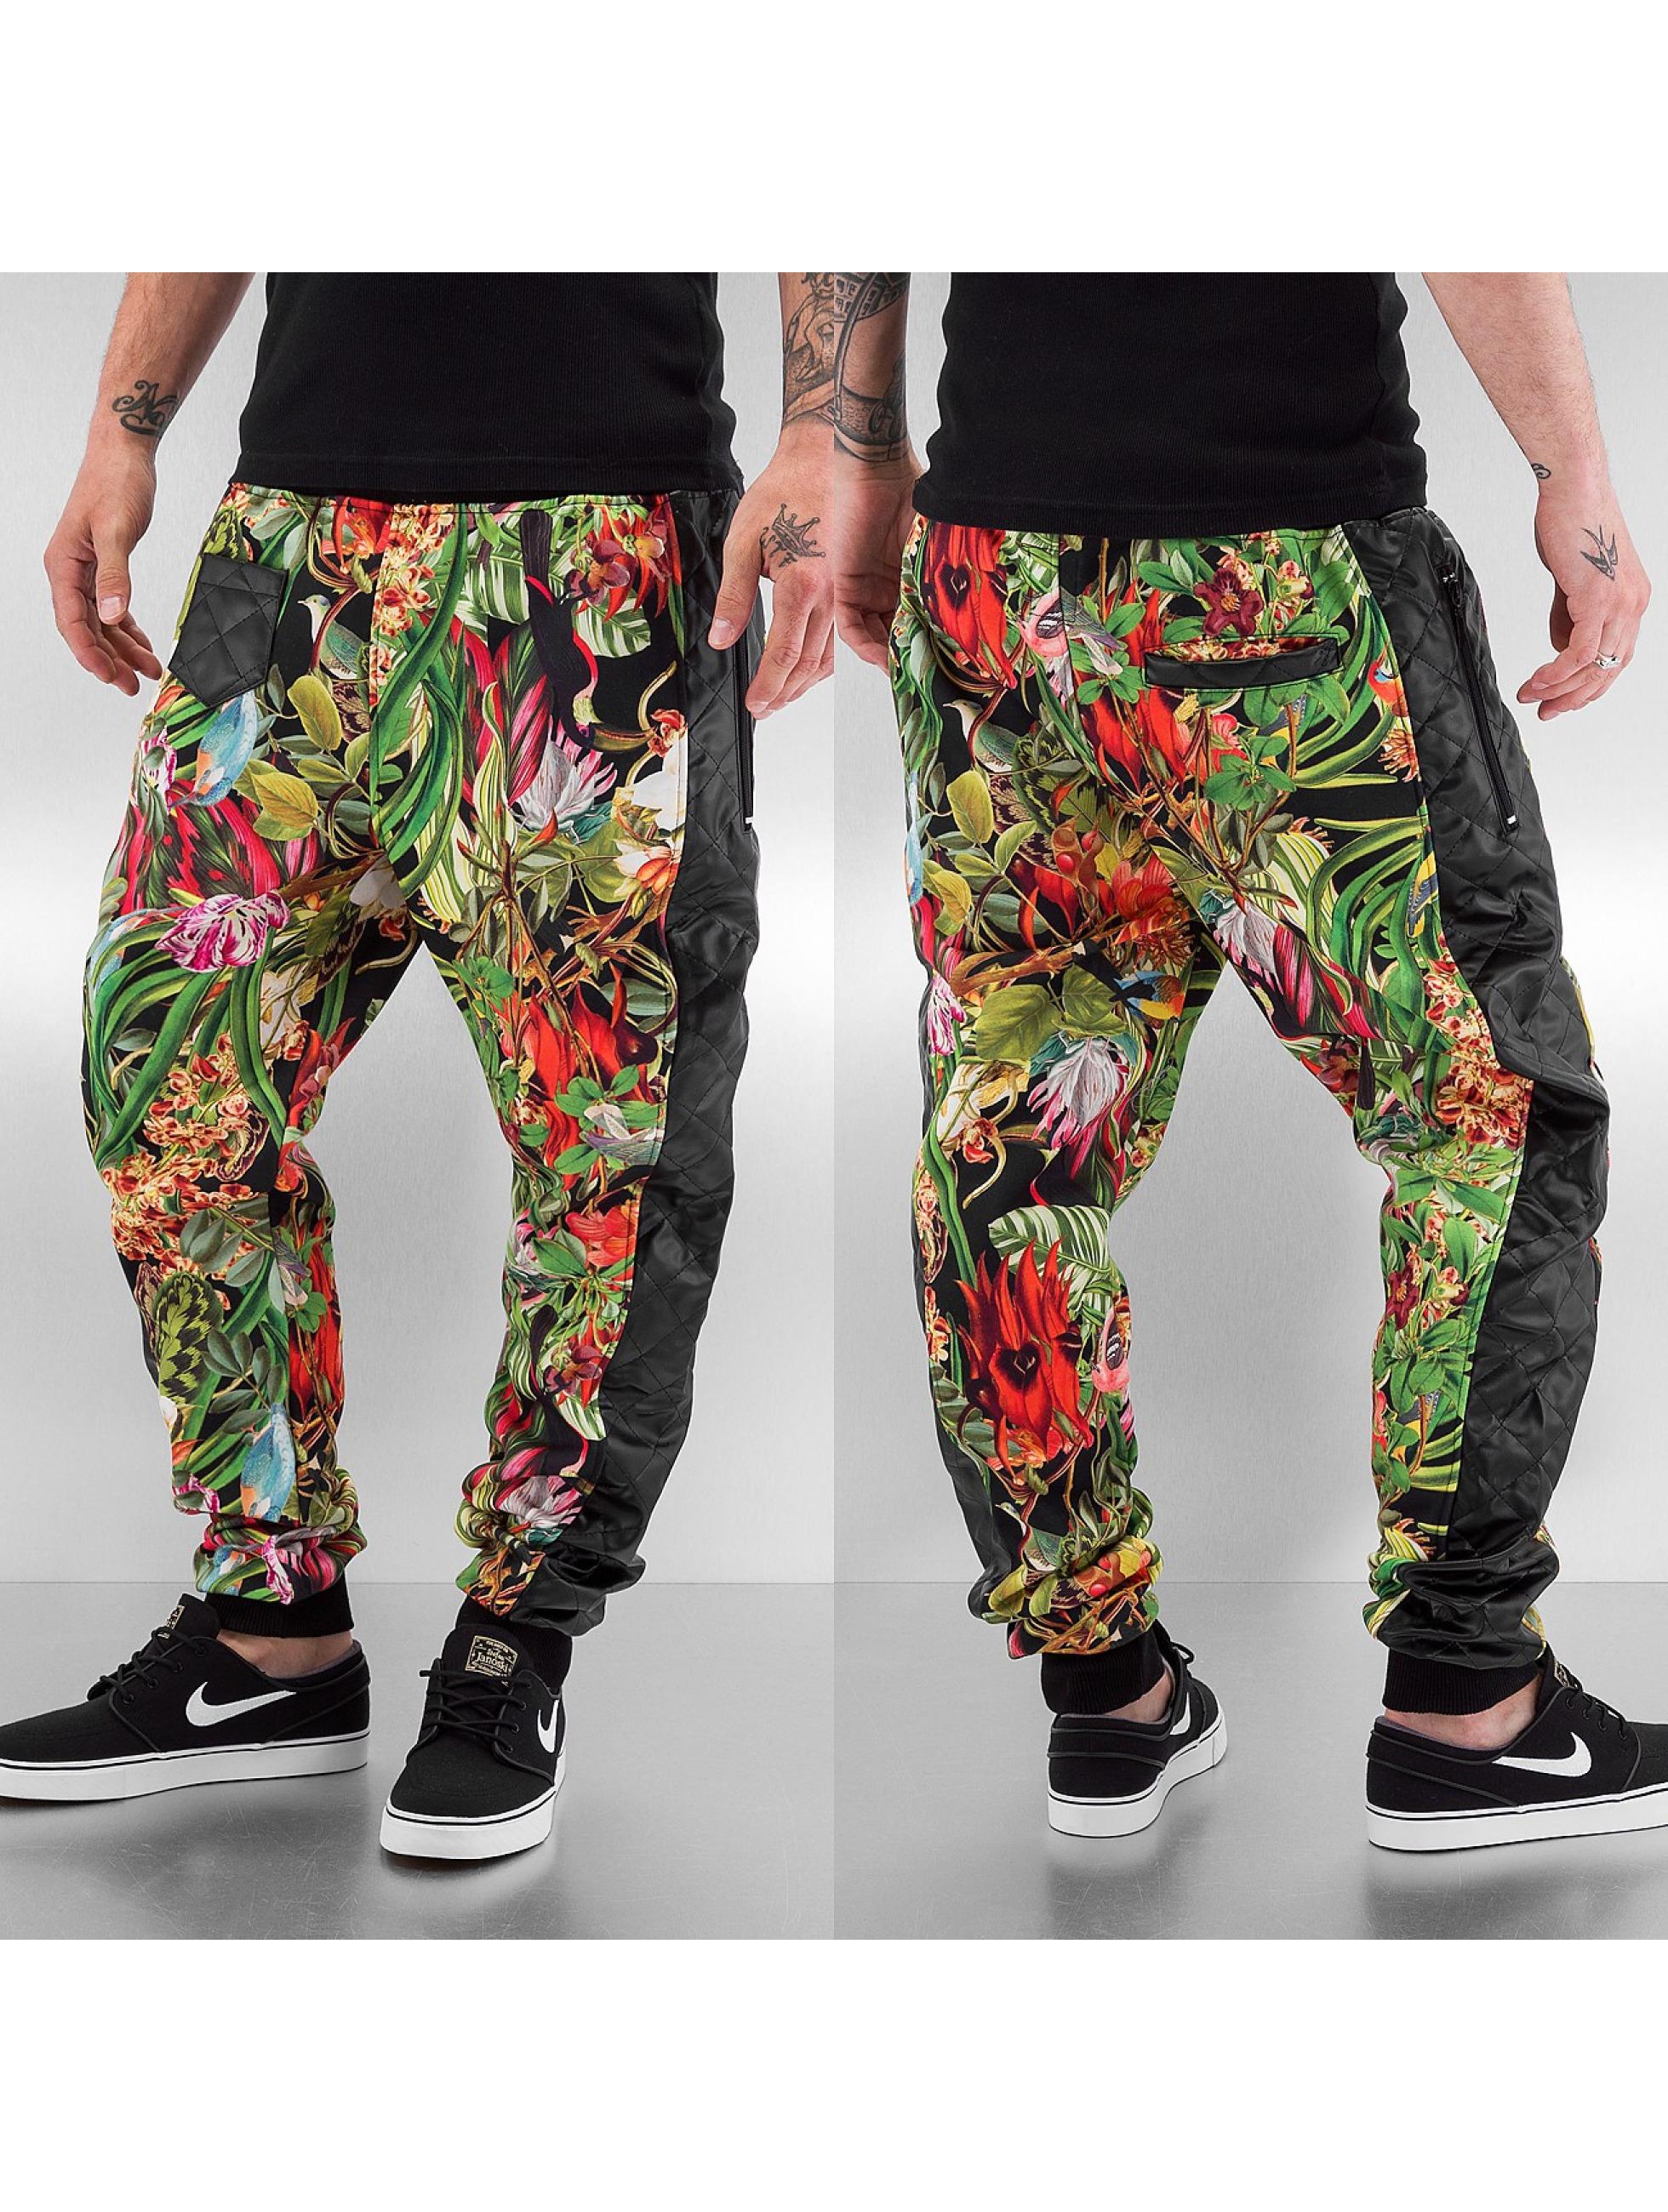 Just Rhyse Jungle Sweat Pants Colored Sale Angebote Dissen-Striesow